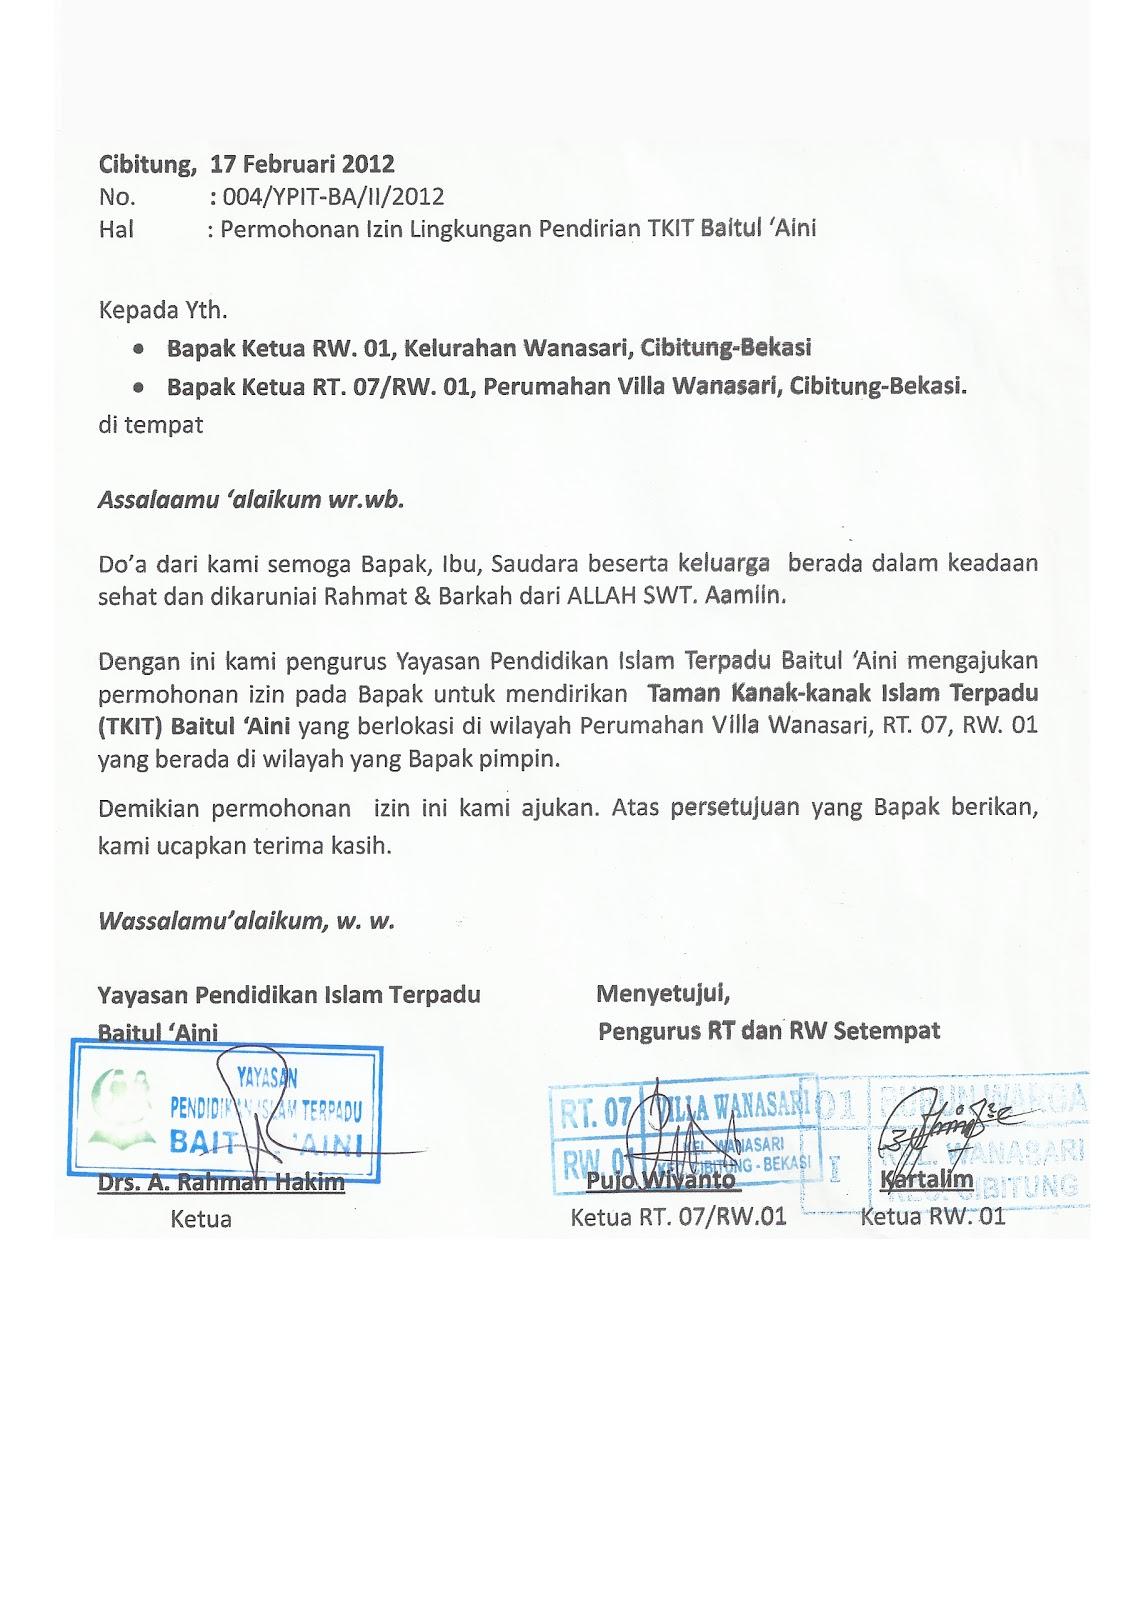 TKIT-TPQ BAITUL 'AINI: Contoh Surat Izin Lingkungan ...